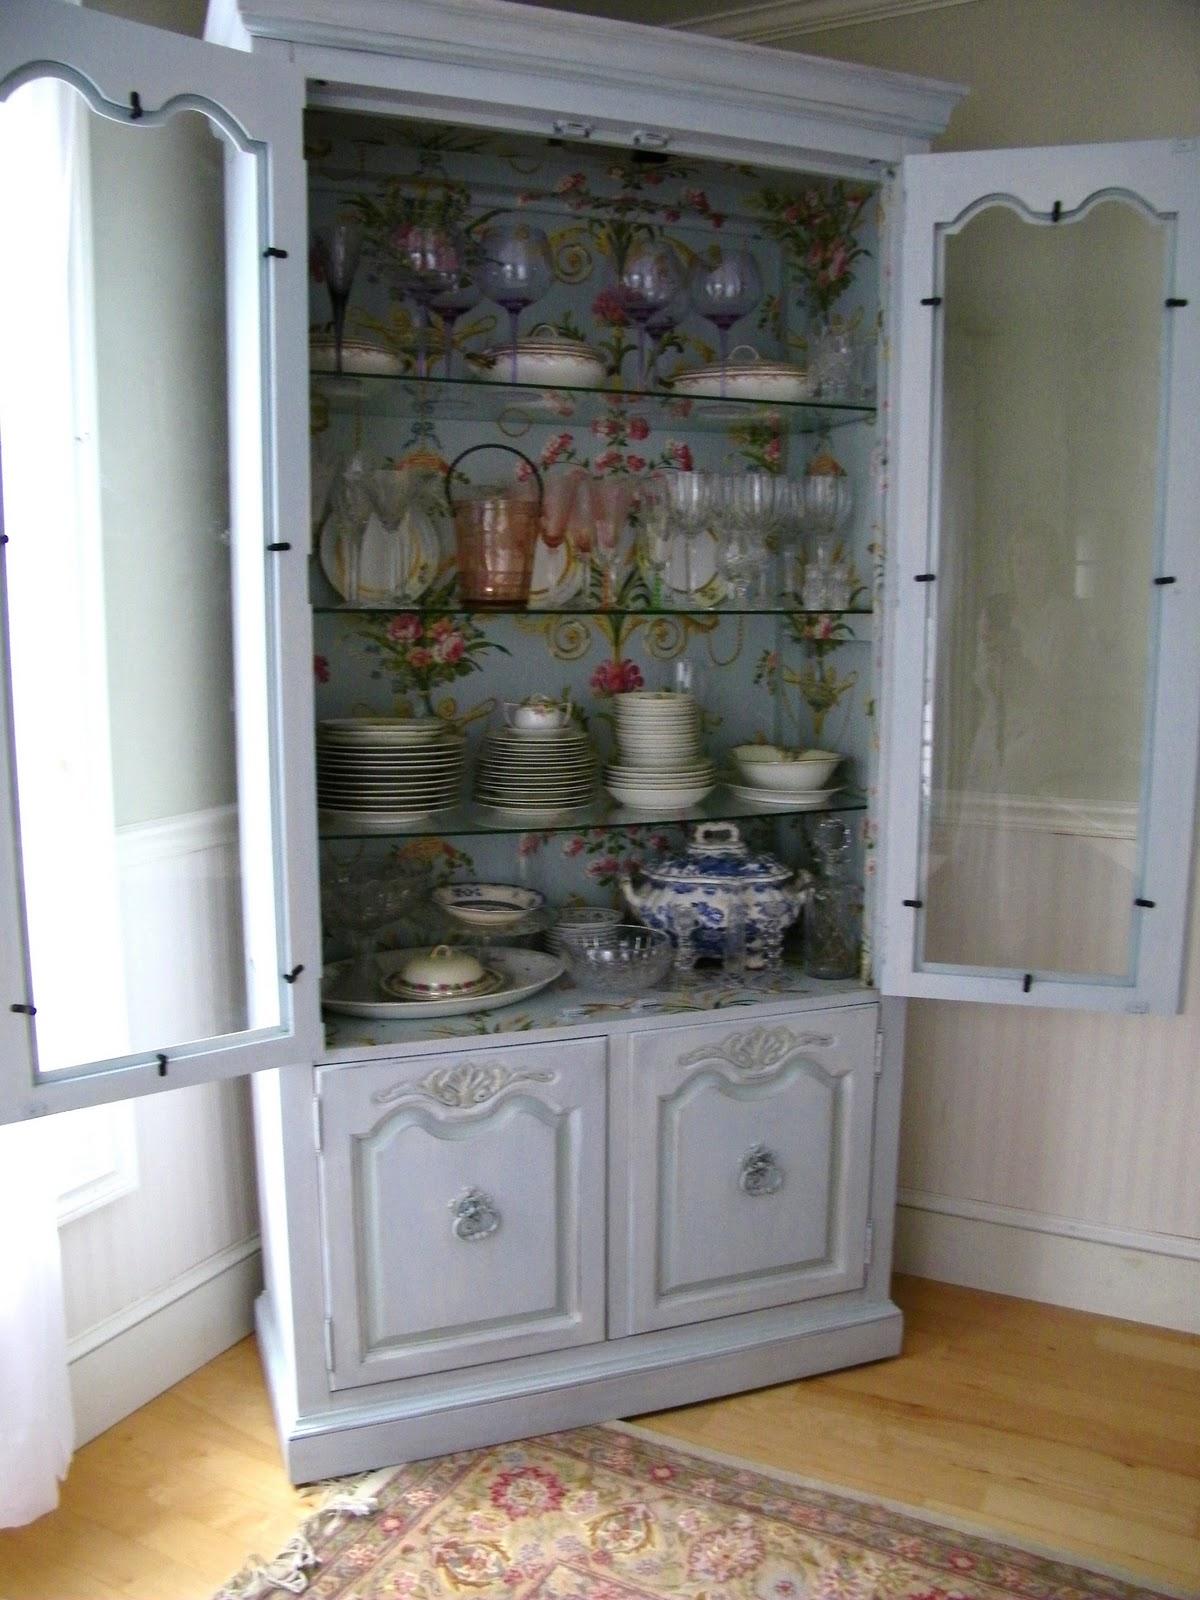 http://3.bp.blogspot.com/-kaSyco3k8y0/TZCcxSD4iQI/AAAAAAAAEQU/tw2VgR92jvQ/s1600/wallpaper+cabinet+065.JPG